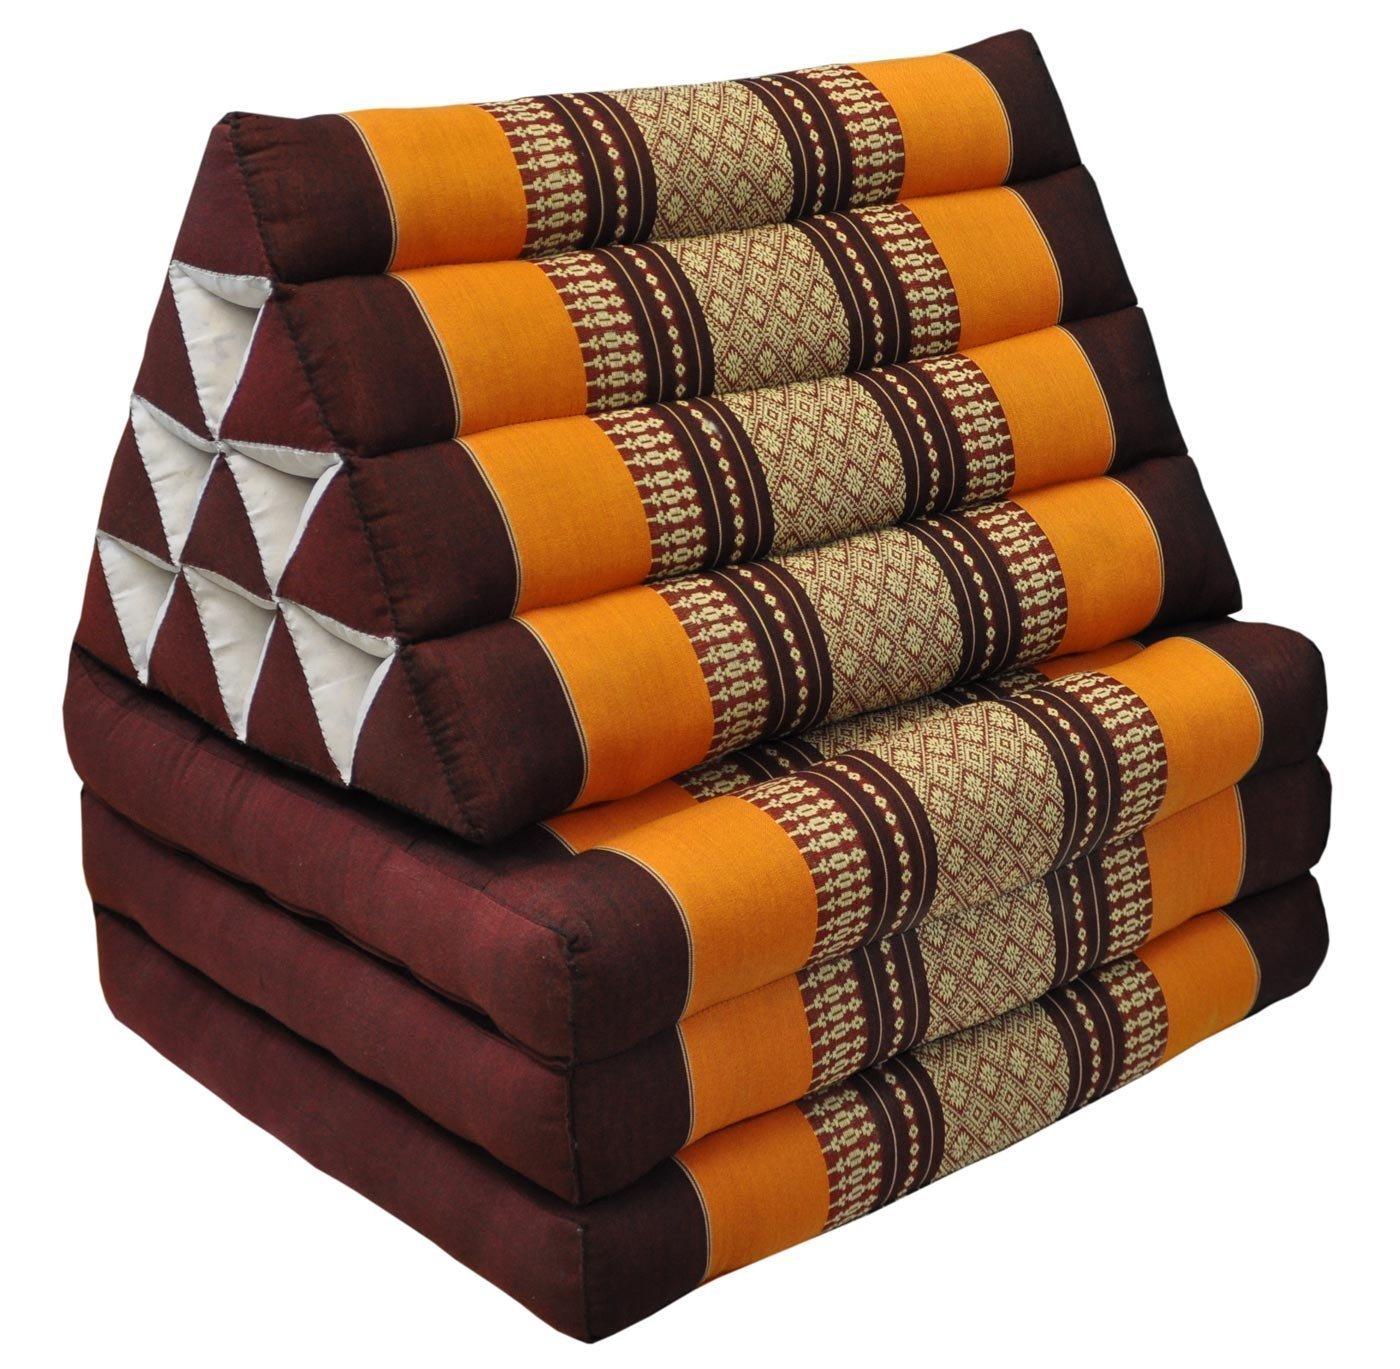 Thai Handmade Foldout Triangle Thai Cushion, 67x21x3 inches, Kapok Fabric, Brown Orange, Premium Double Stitched by WADSUWAN SHOP